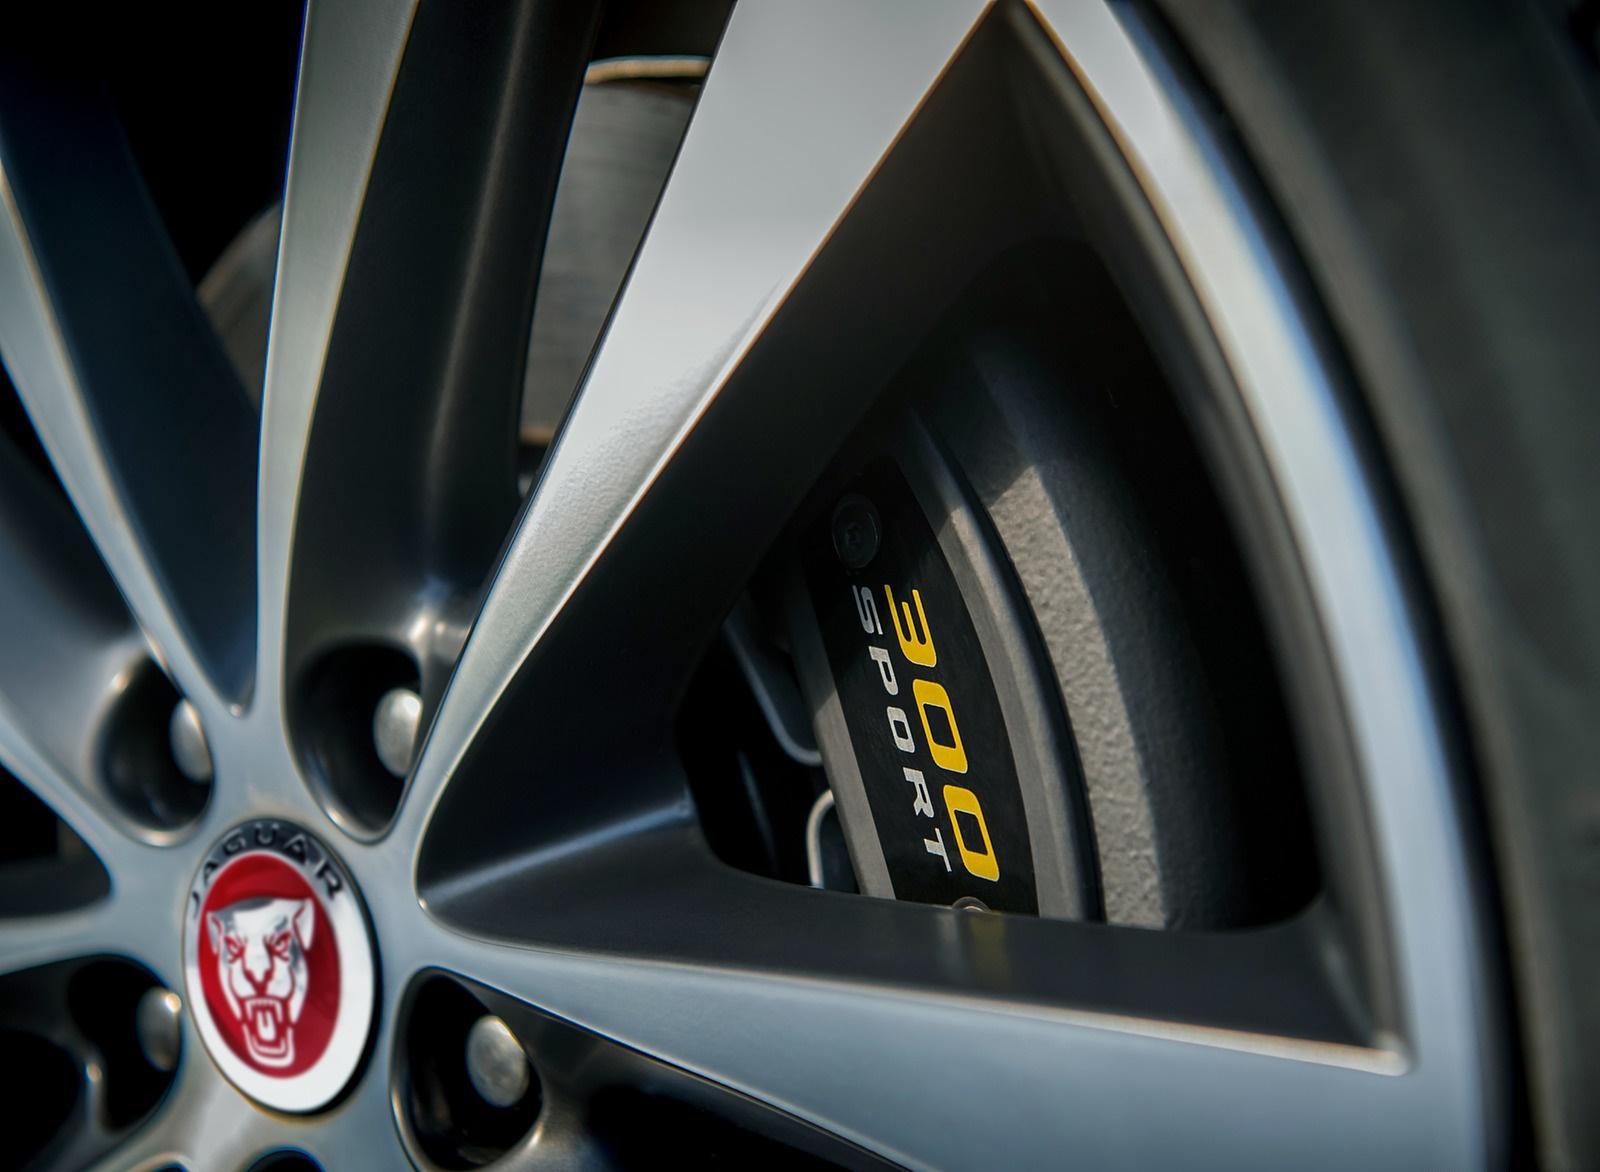 2019 Jaguar XE 300 SPORT Wheel Wallpaper (13)